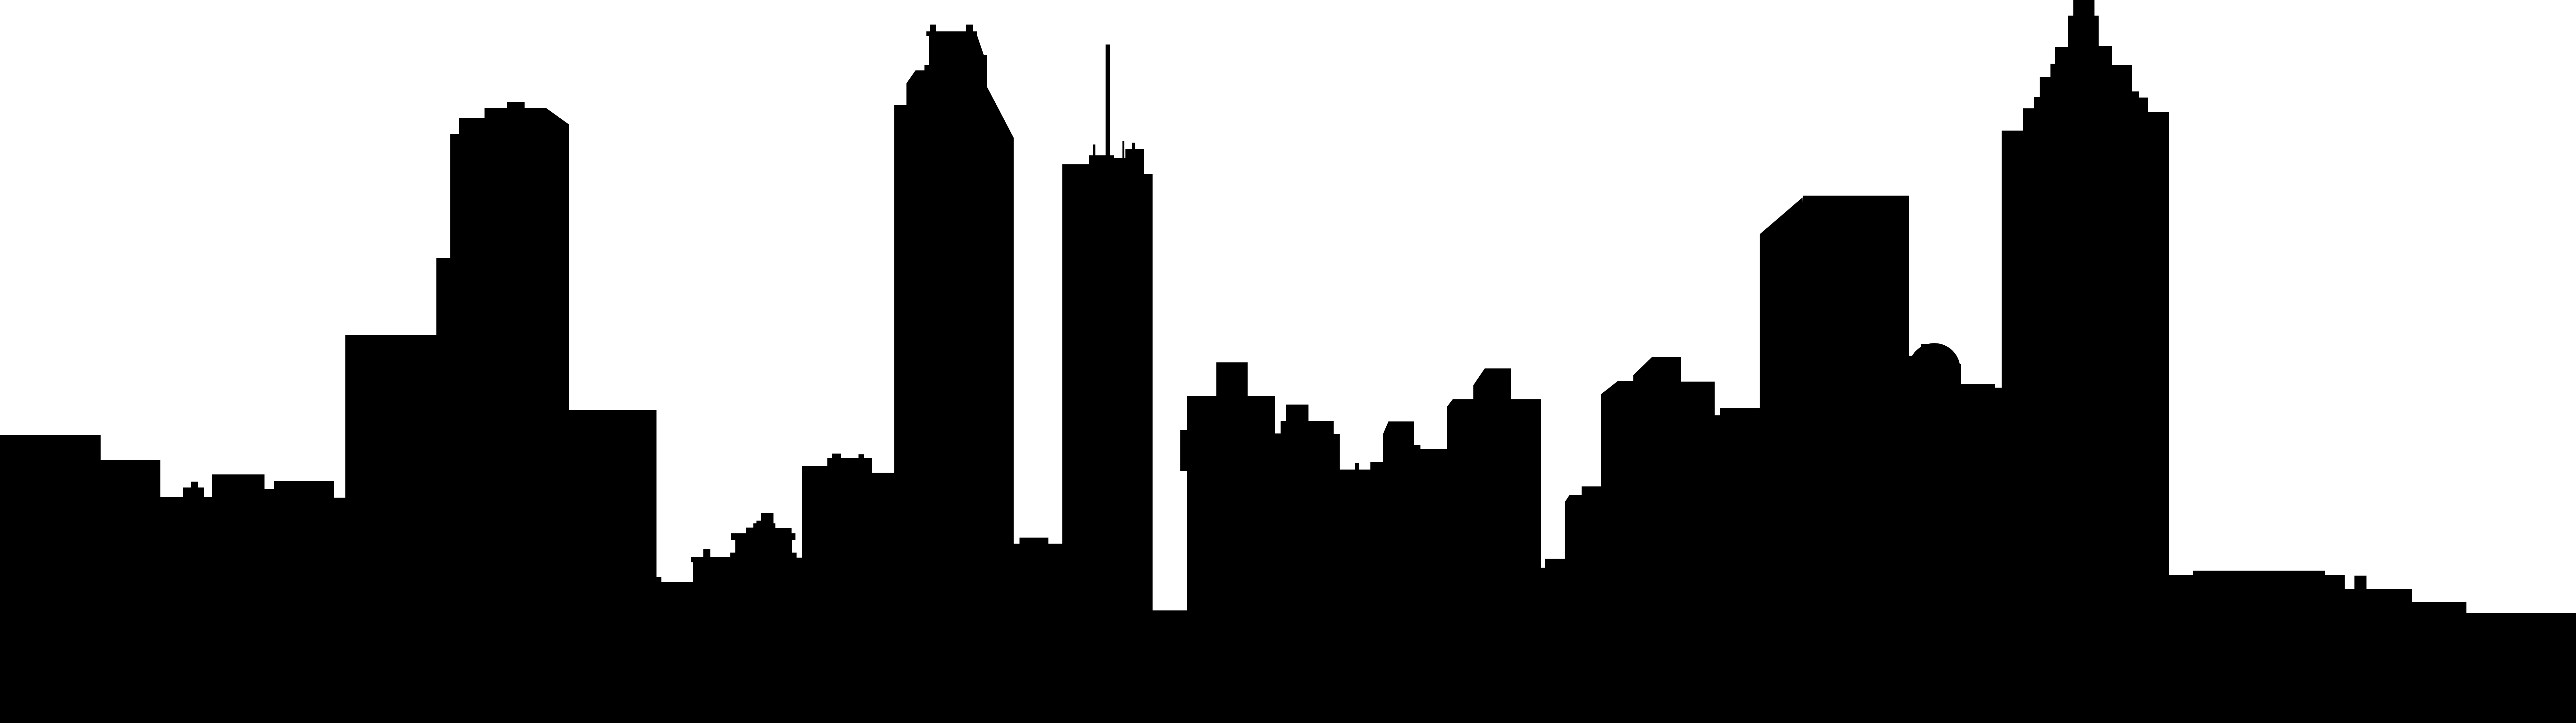 Free hd vector images of detroit skyline clipart jpg transparent download Atlanta Skyline Vector, sun asian kitchen - 8-Ball.net - Clip Art ... jpg transparent download